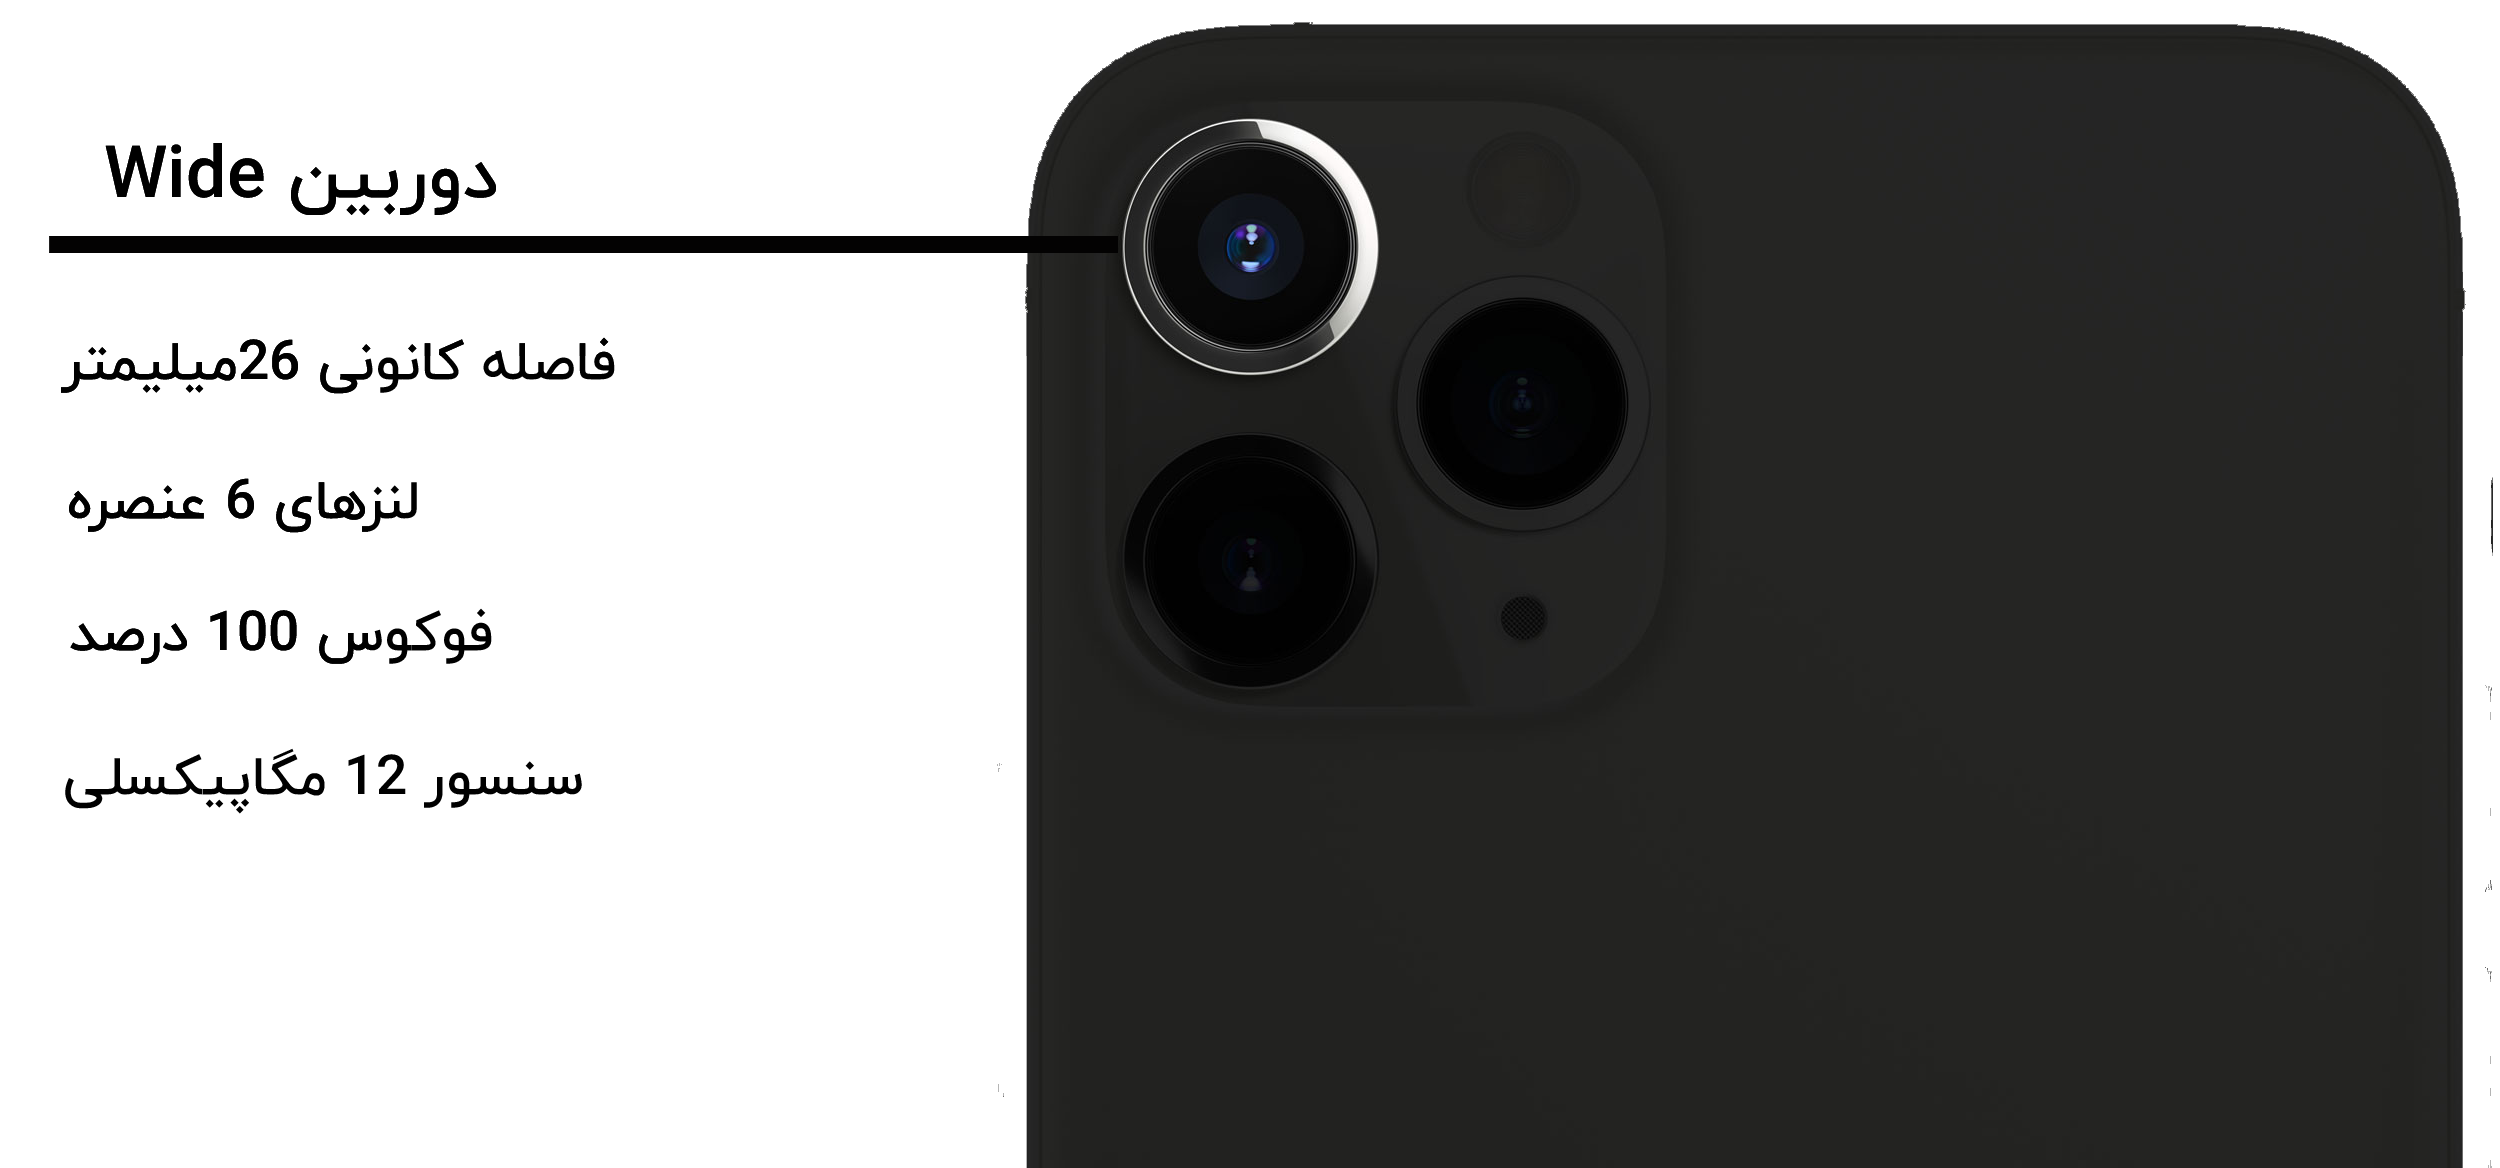 iphone-11-pro-camera-1